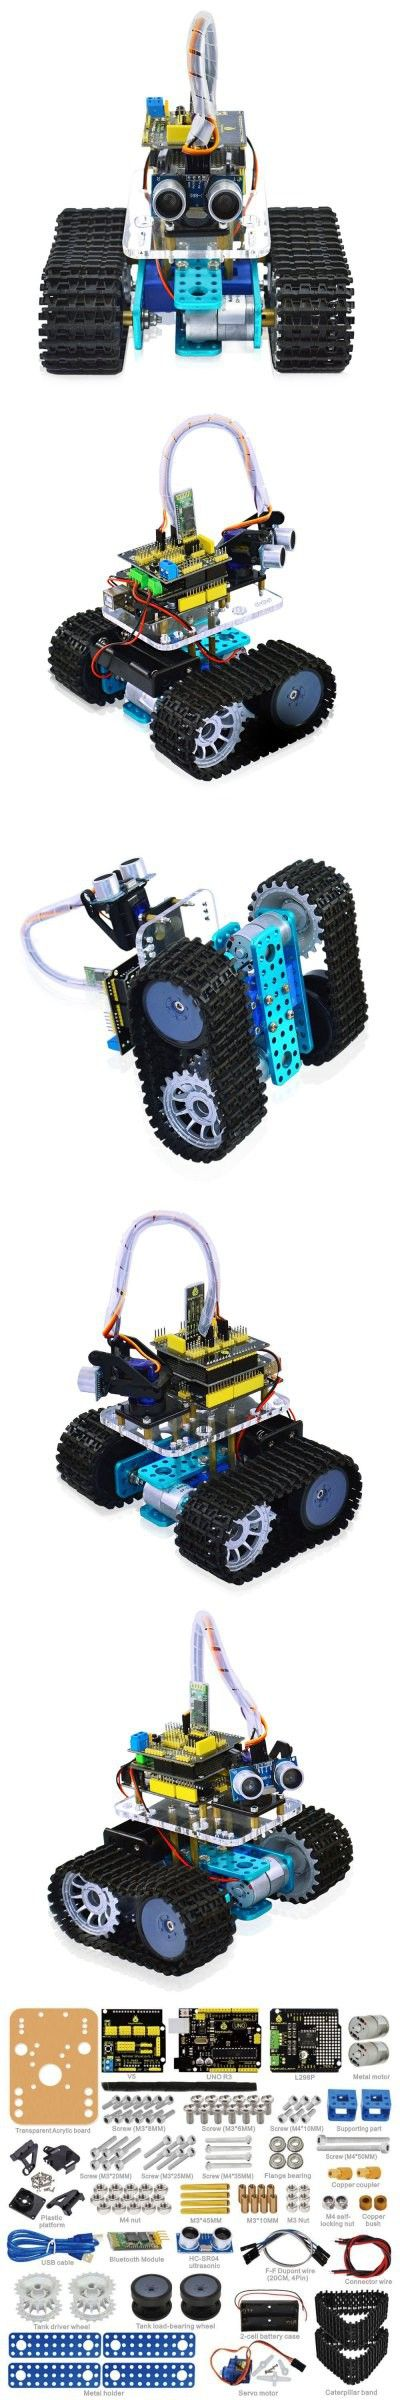 Arduino & SCM Supplies | Keyestudio TS - 50 Mini Bluetooth Tank Robot Smart Car Kit $66.16